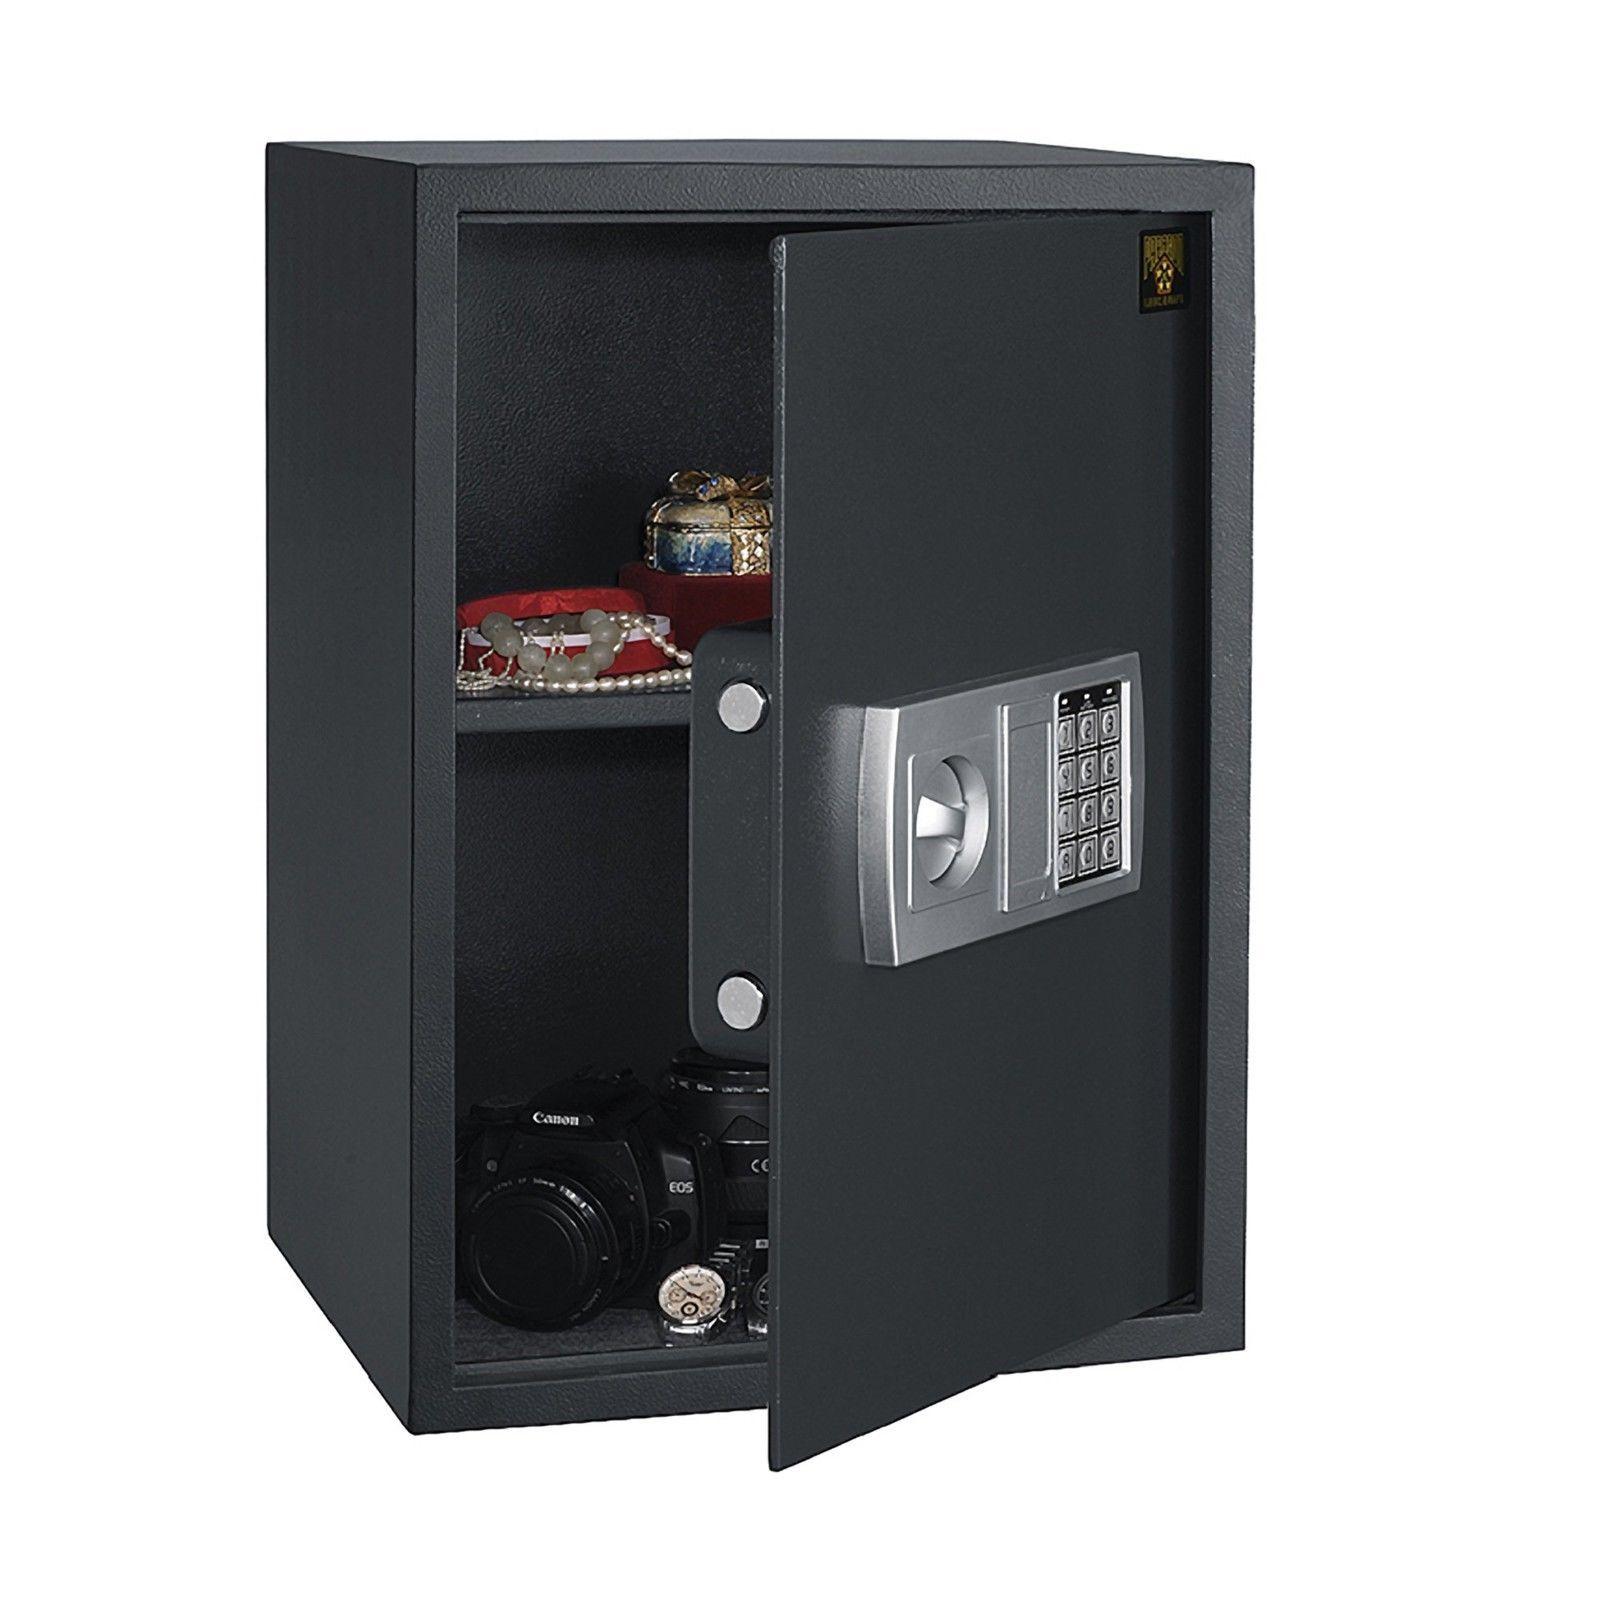 Large Digital Fire Safe Electronic Lock Box Security Steel